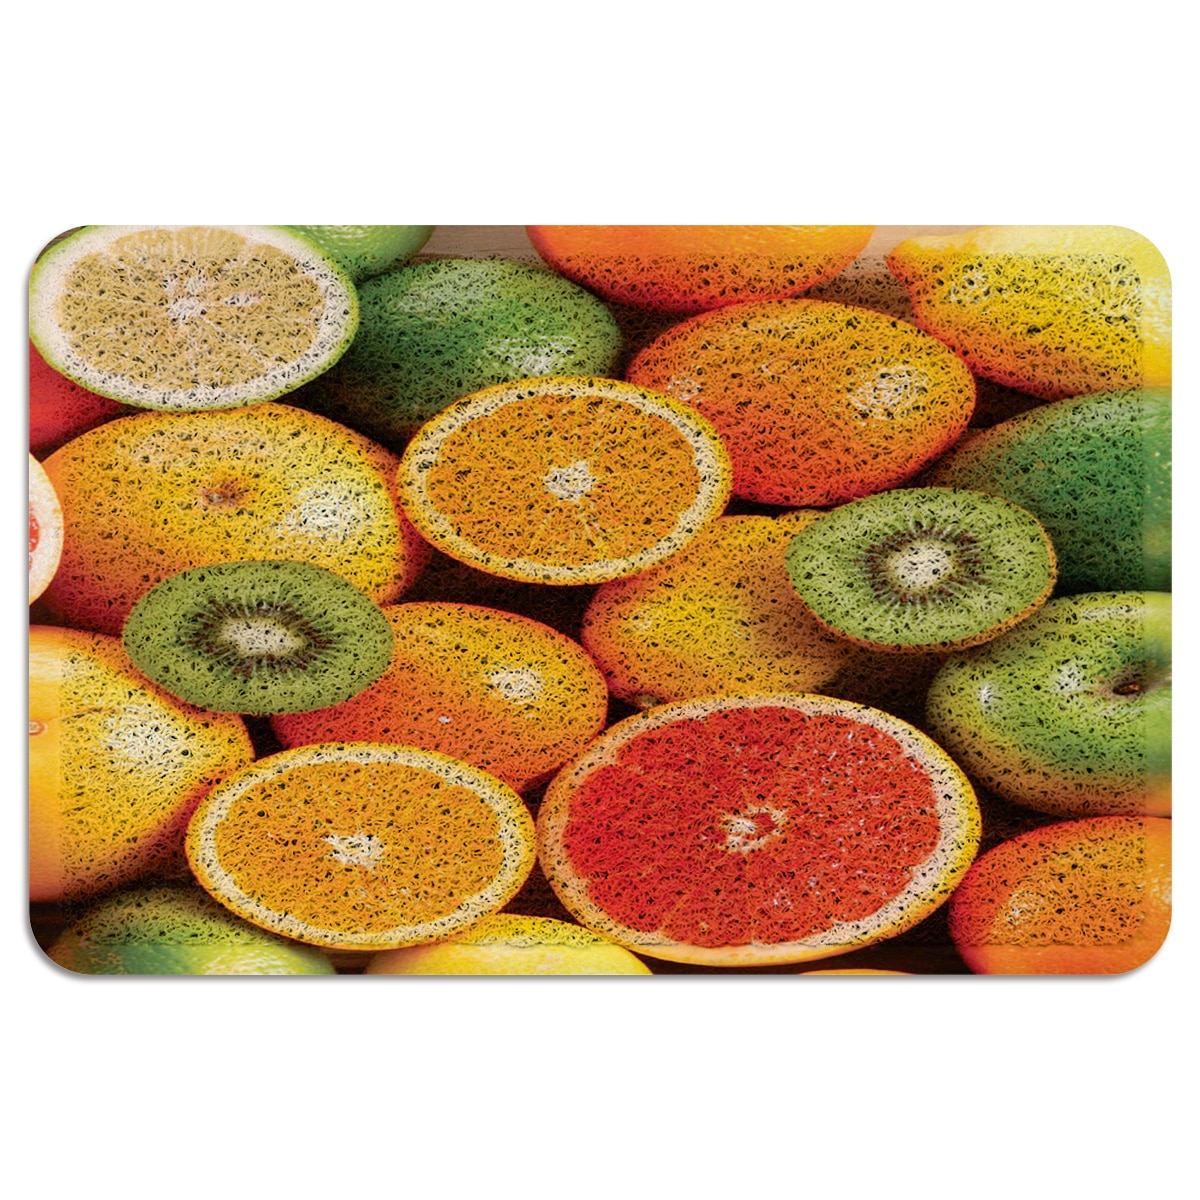 Alfombra de puerta naranja Kiwi naranja con lazo de alambre para exteriores, alfombra para pasillo, cocina, baño, felpudo antideslizante para entrada, decoración del hogar